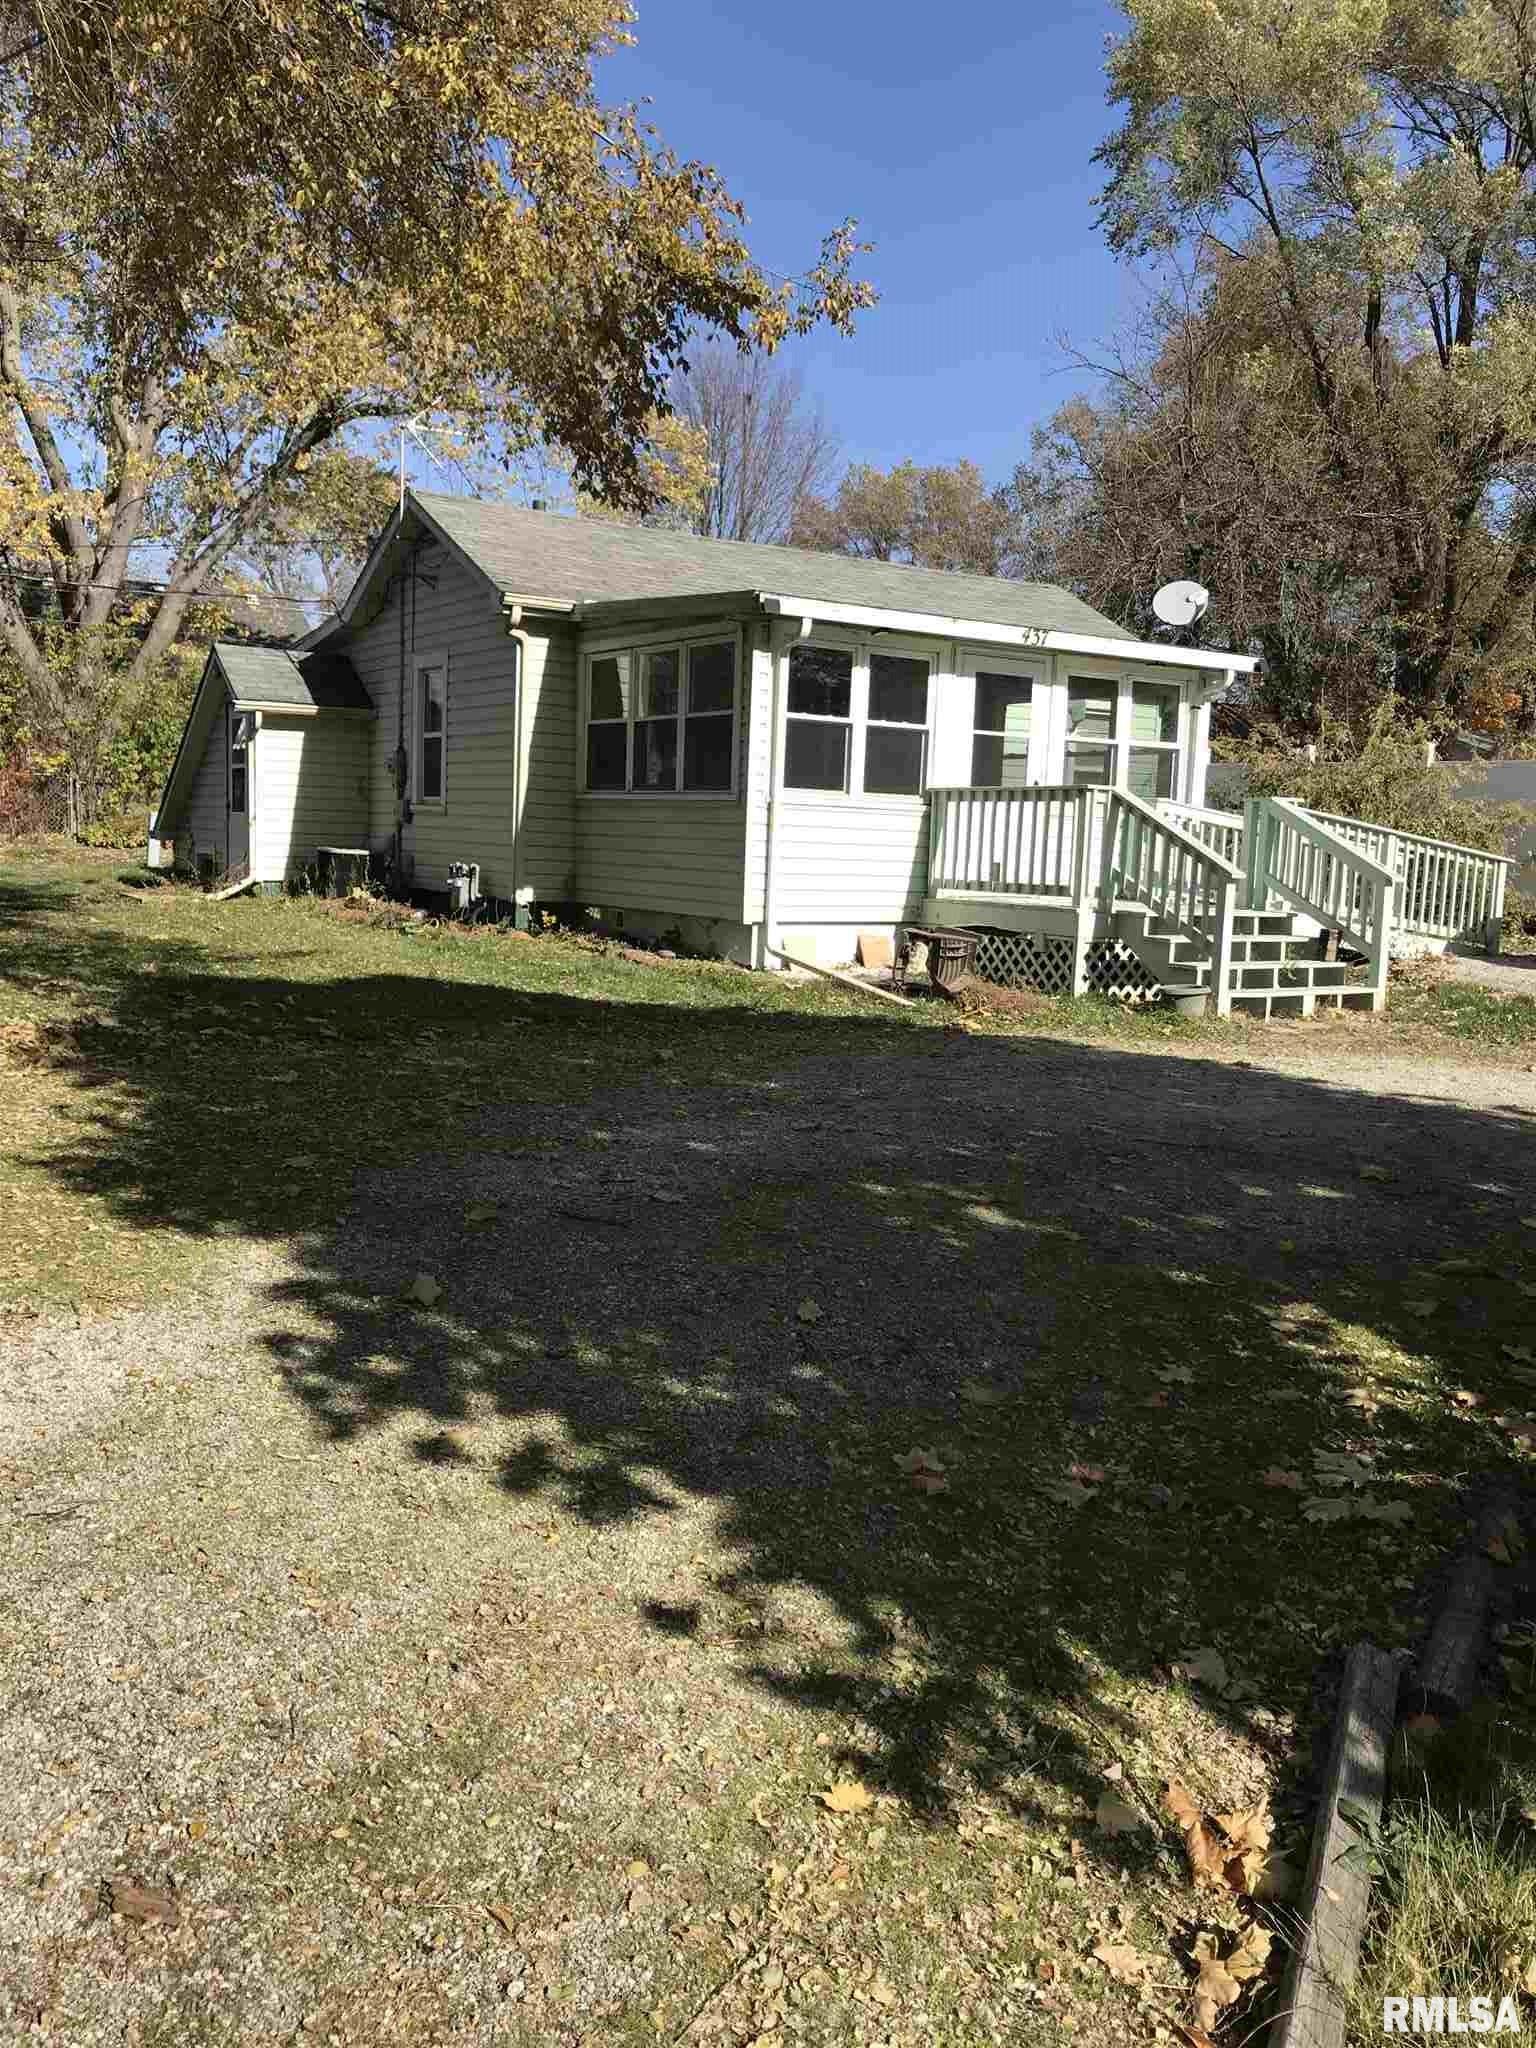 437 ROOSEVELT Property Photo - Creve Coeur, IL real estate listing